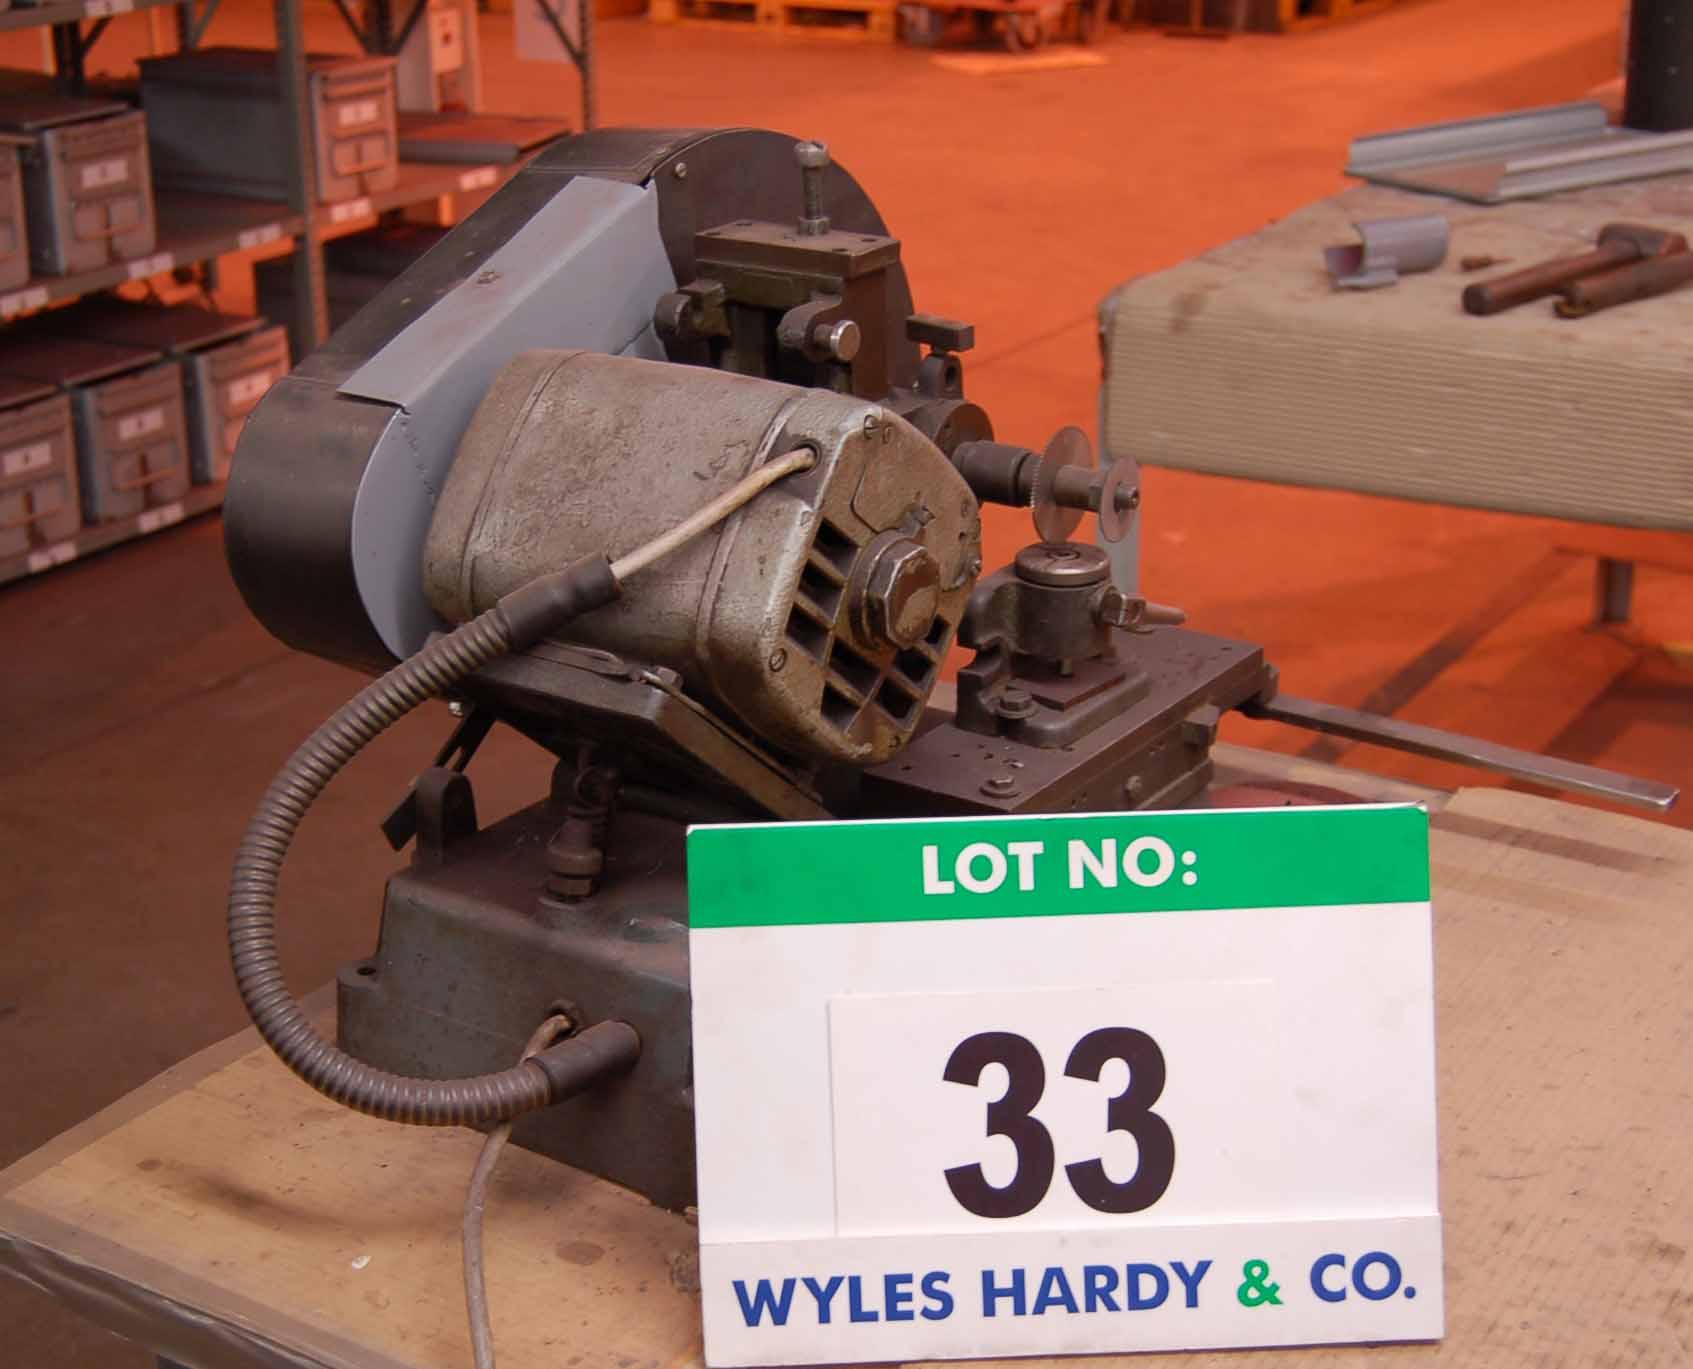 Lot 33 - ERMA, SEC OP MIL Bench top Mill Serial No. 1505 240V, (N.B. No Guards)